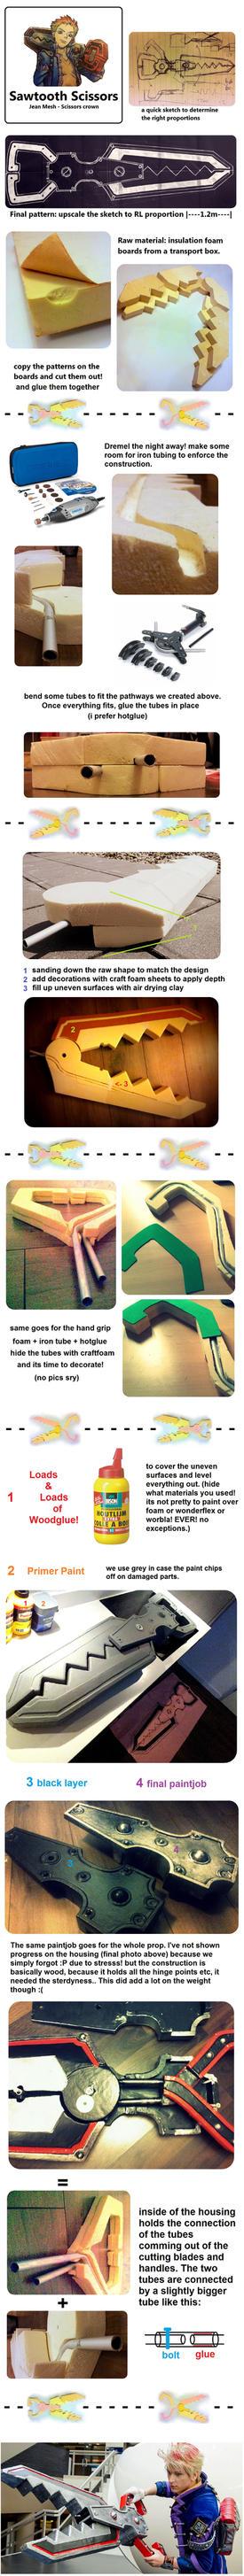 Gene Mesh sawtooth scissors tutorial by Kireus